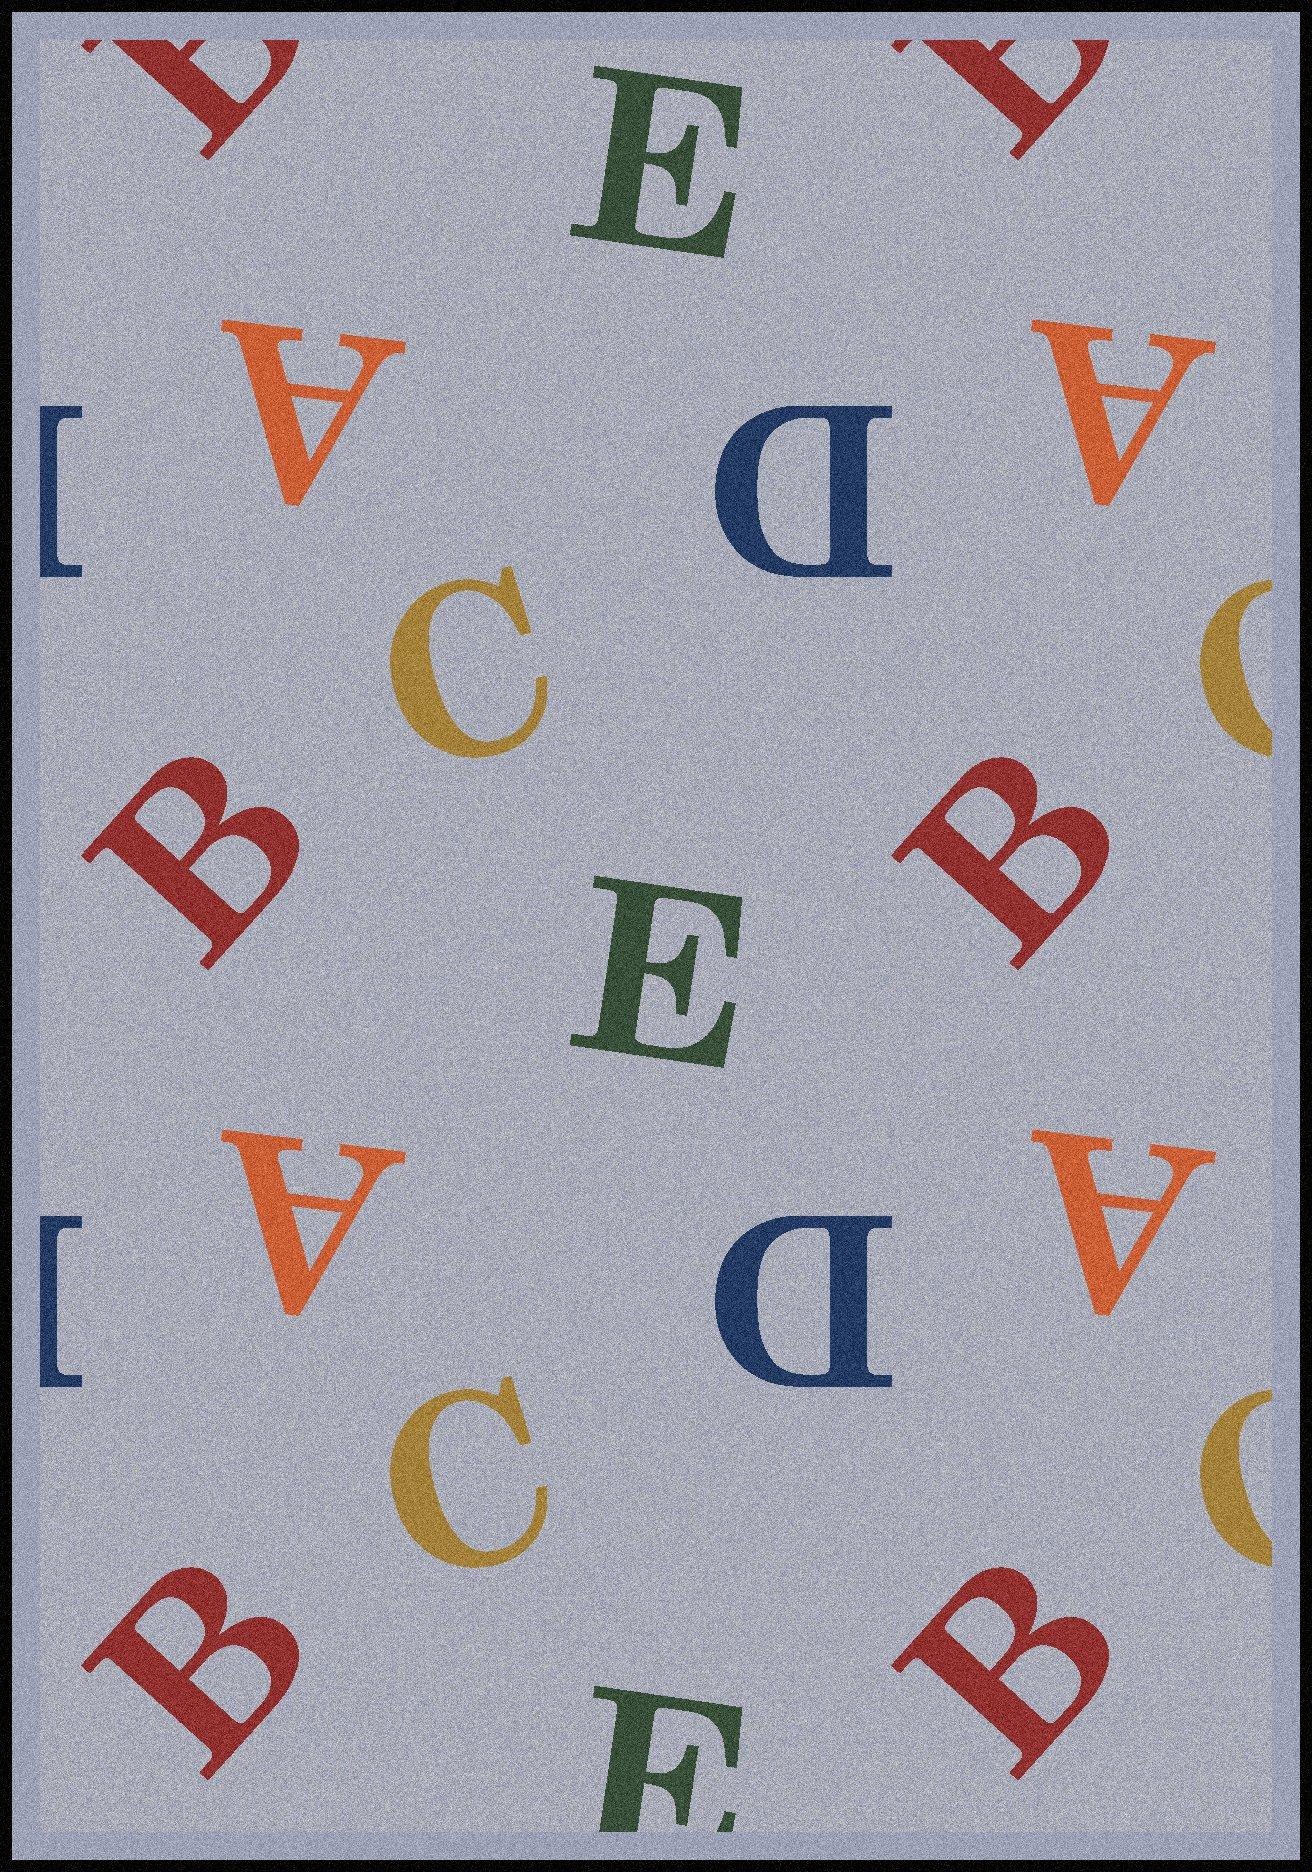 Joy Carpets Playful Patterns Children's Love Letters Area Rug, Chimney Sweep, 7'8'' x 10'9''